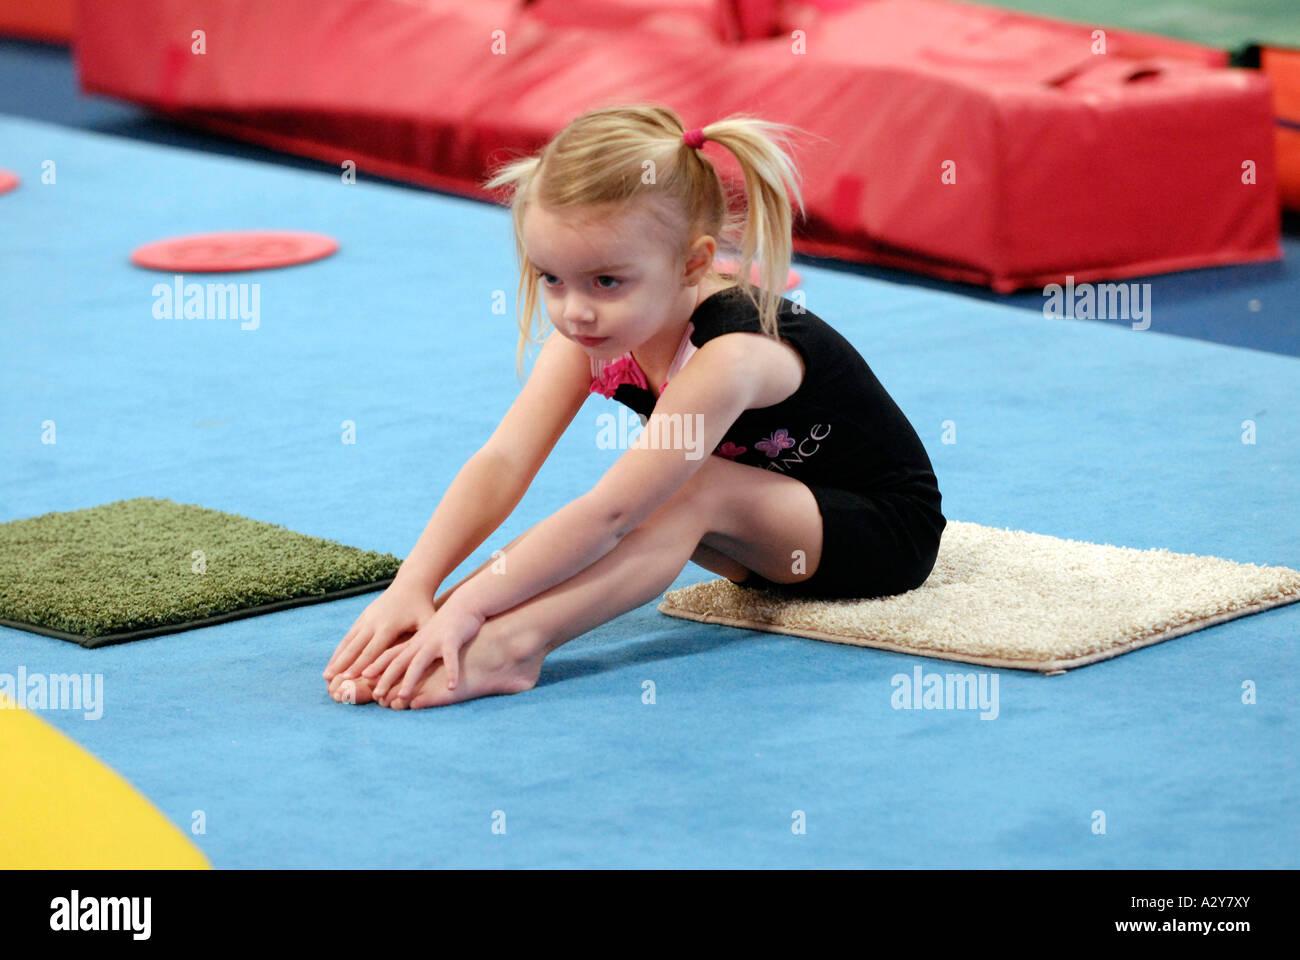 teen-girlies-beginning-gymnastics-for-adults-girl-boobs